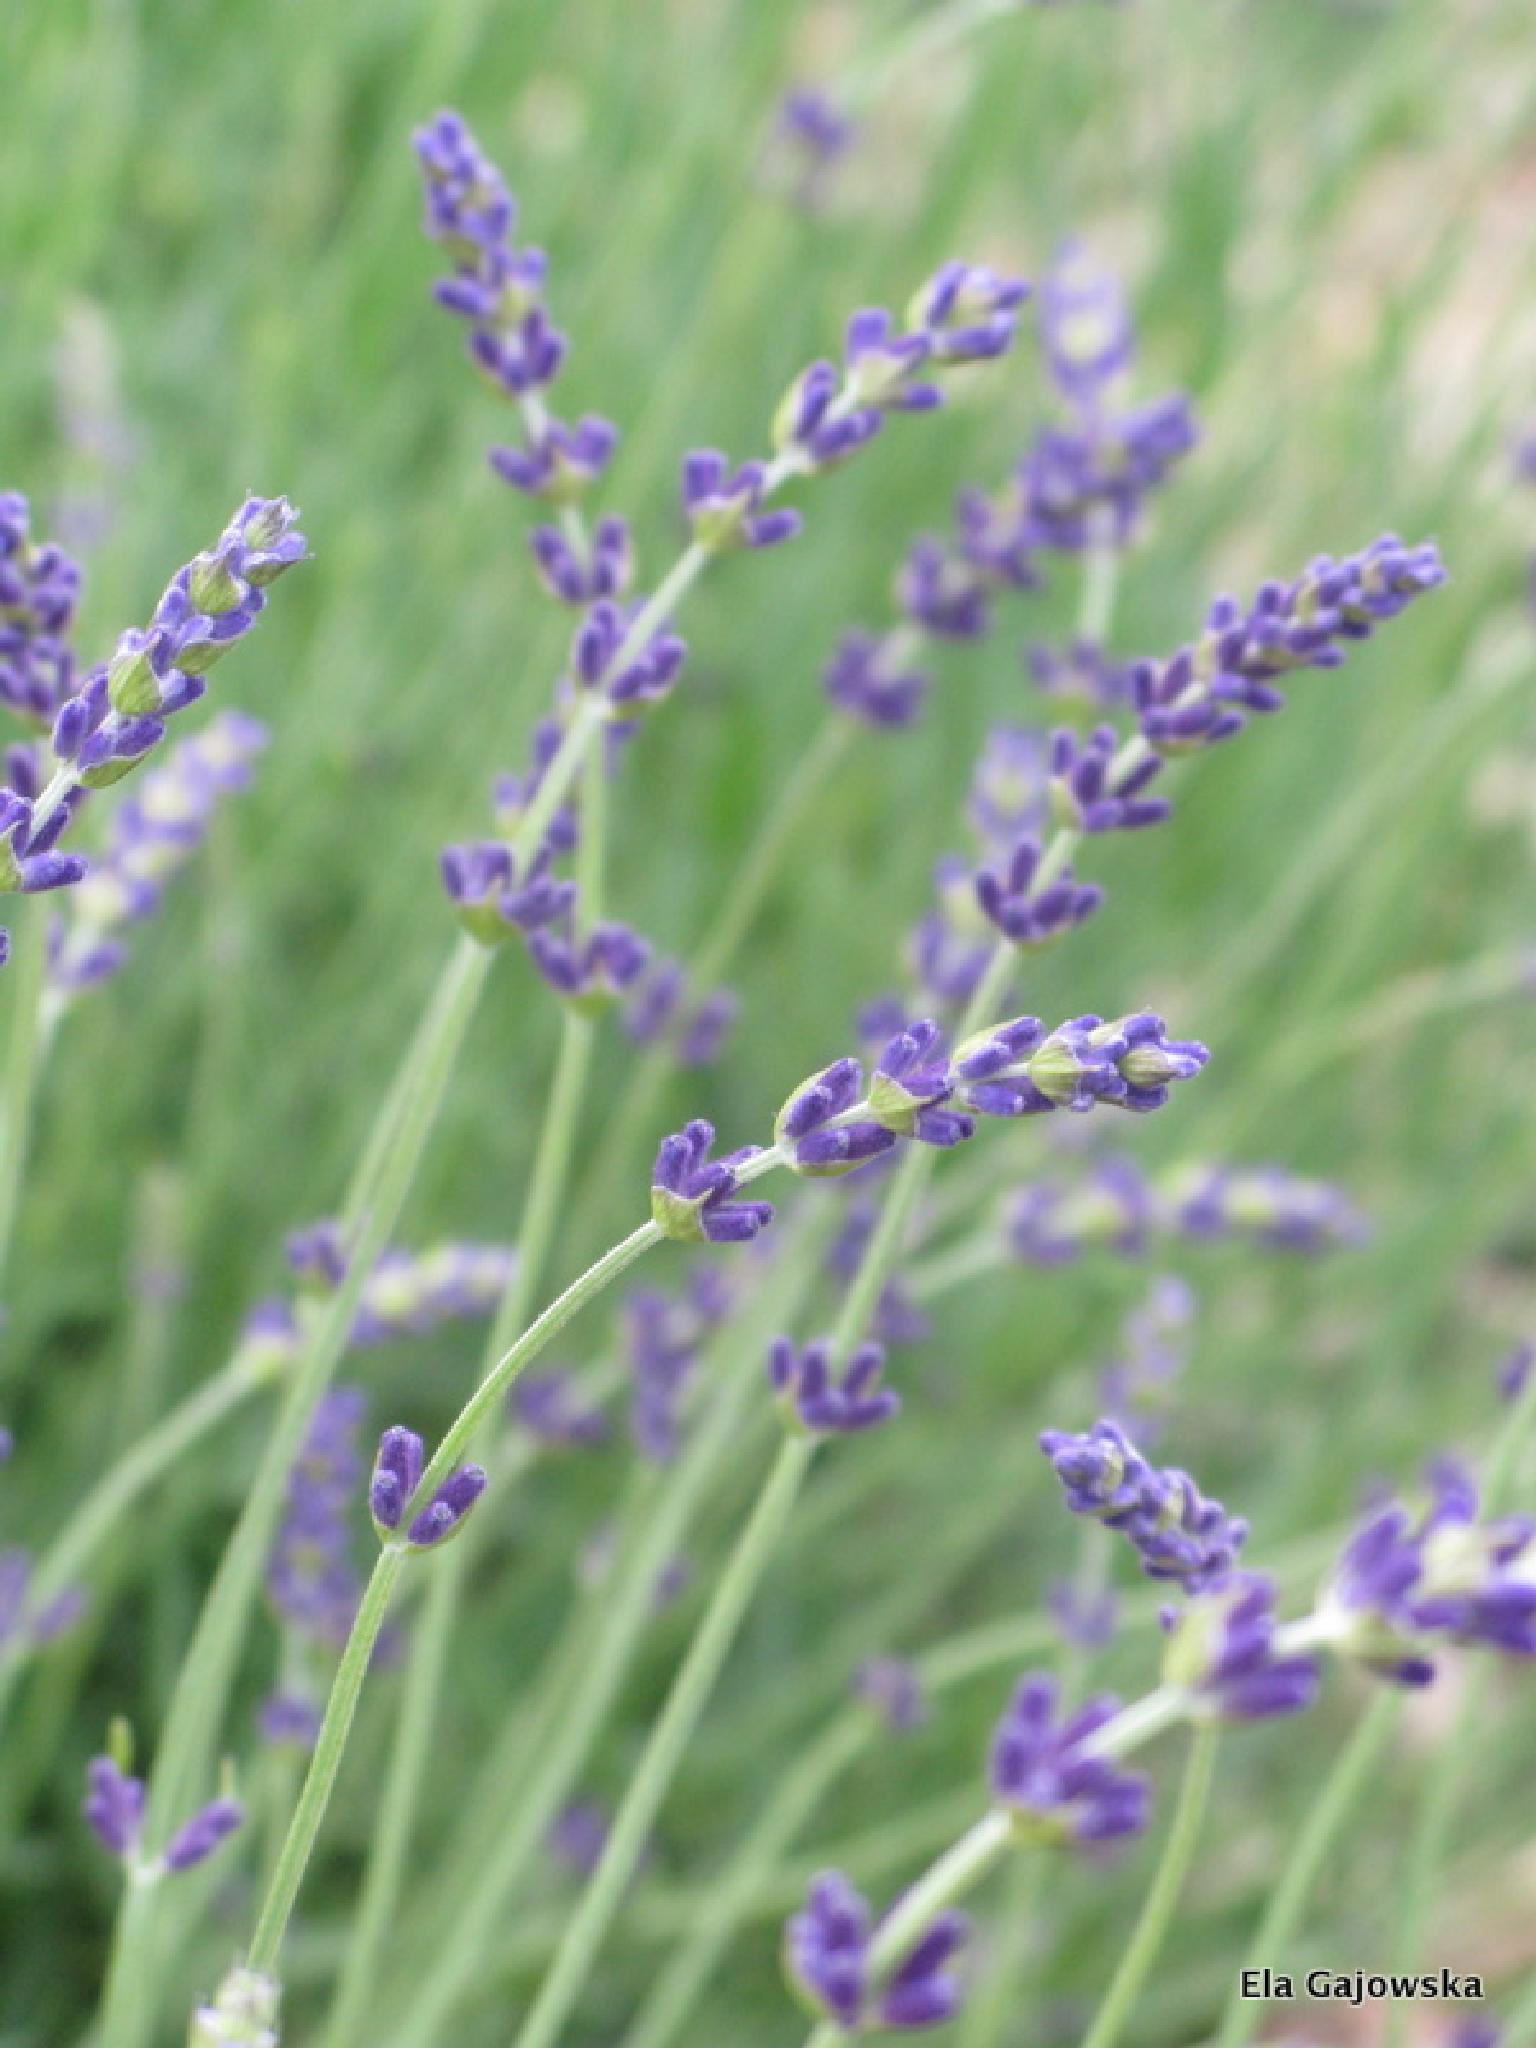 The beginning of lavender season by Ela Gajowska